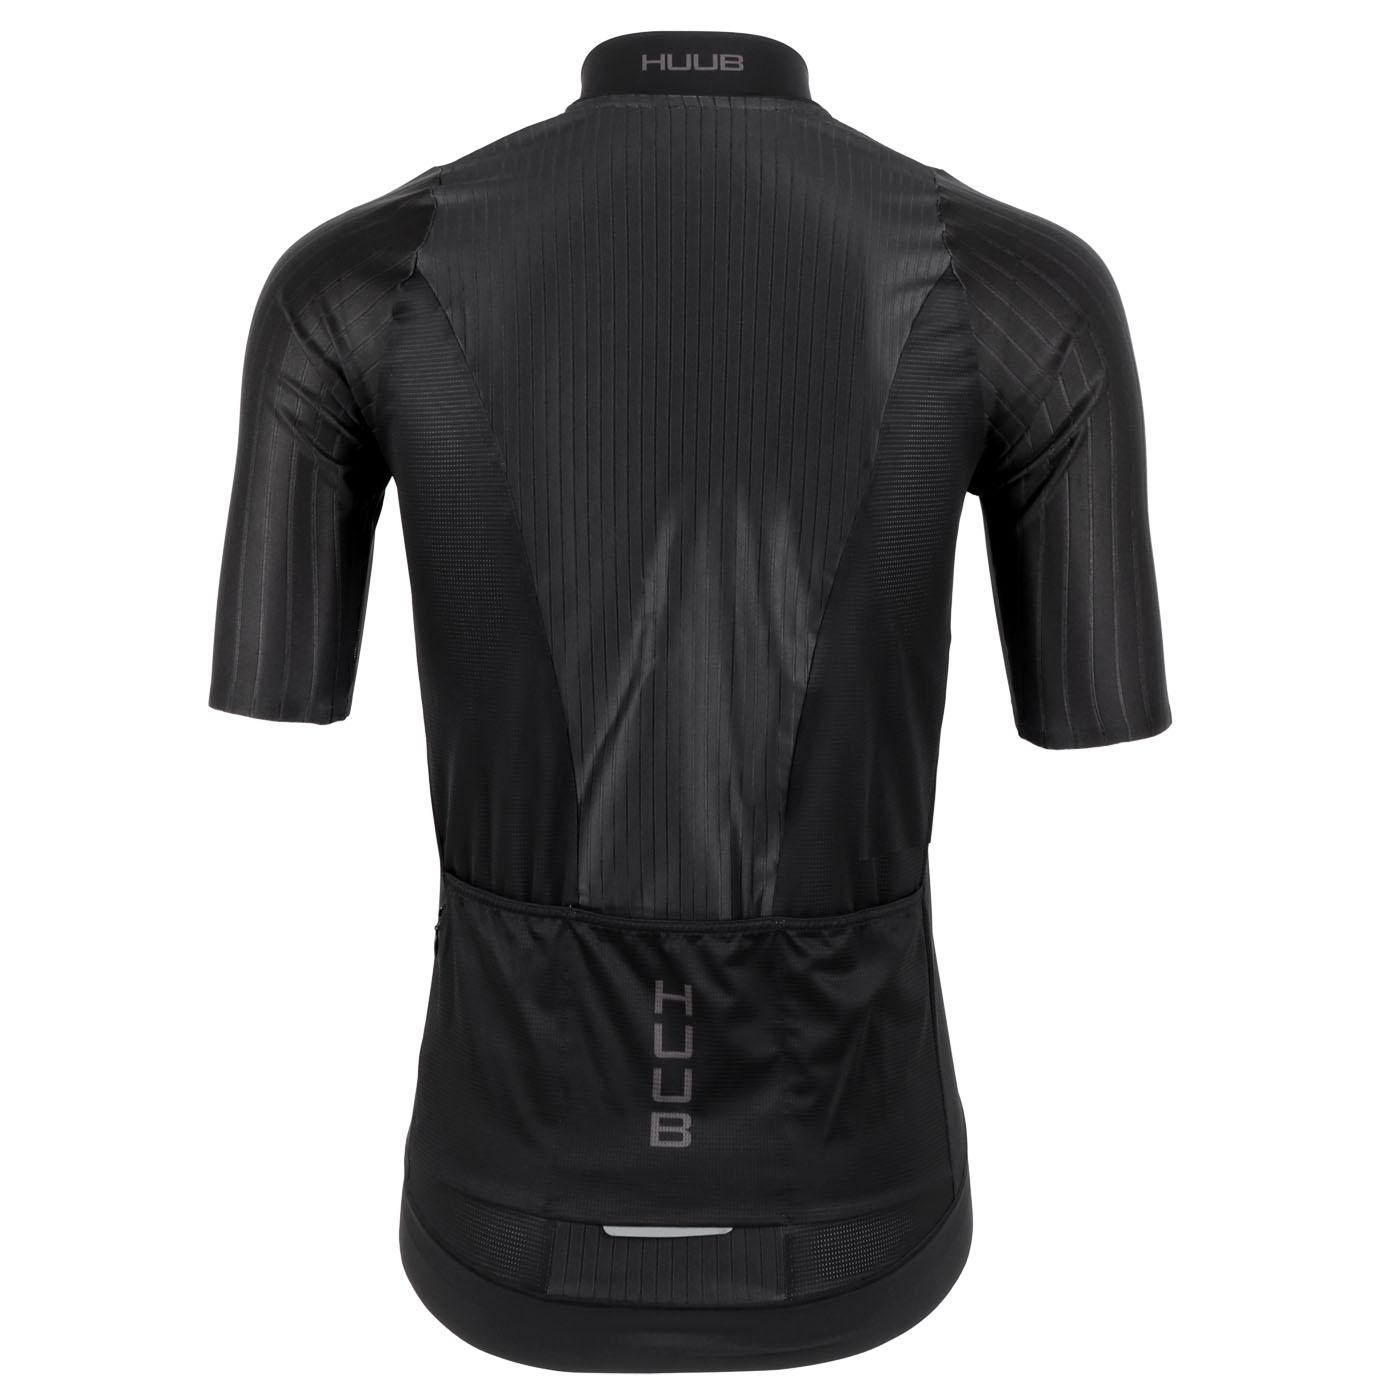 Bild von HUUB Design Aventus Cycle Kurzarm-Trikot - schwarz/charcoal